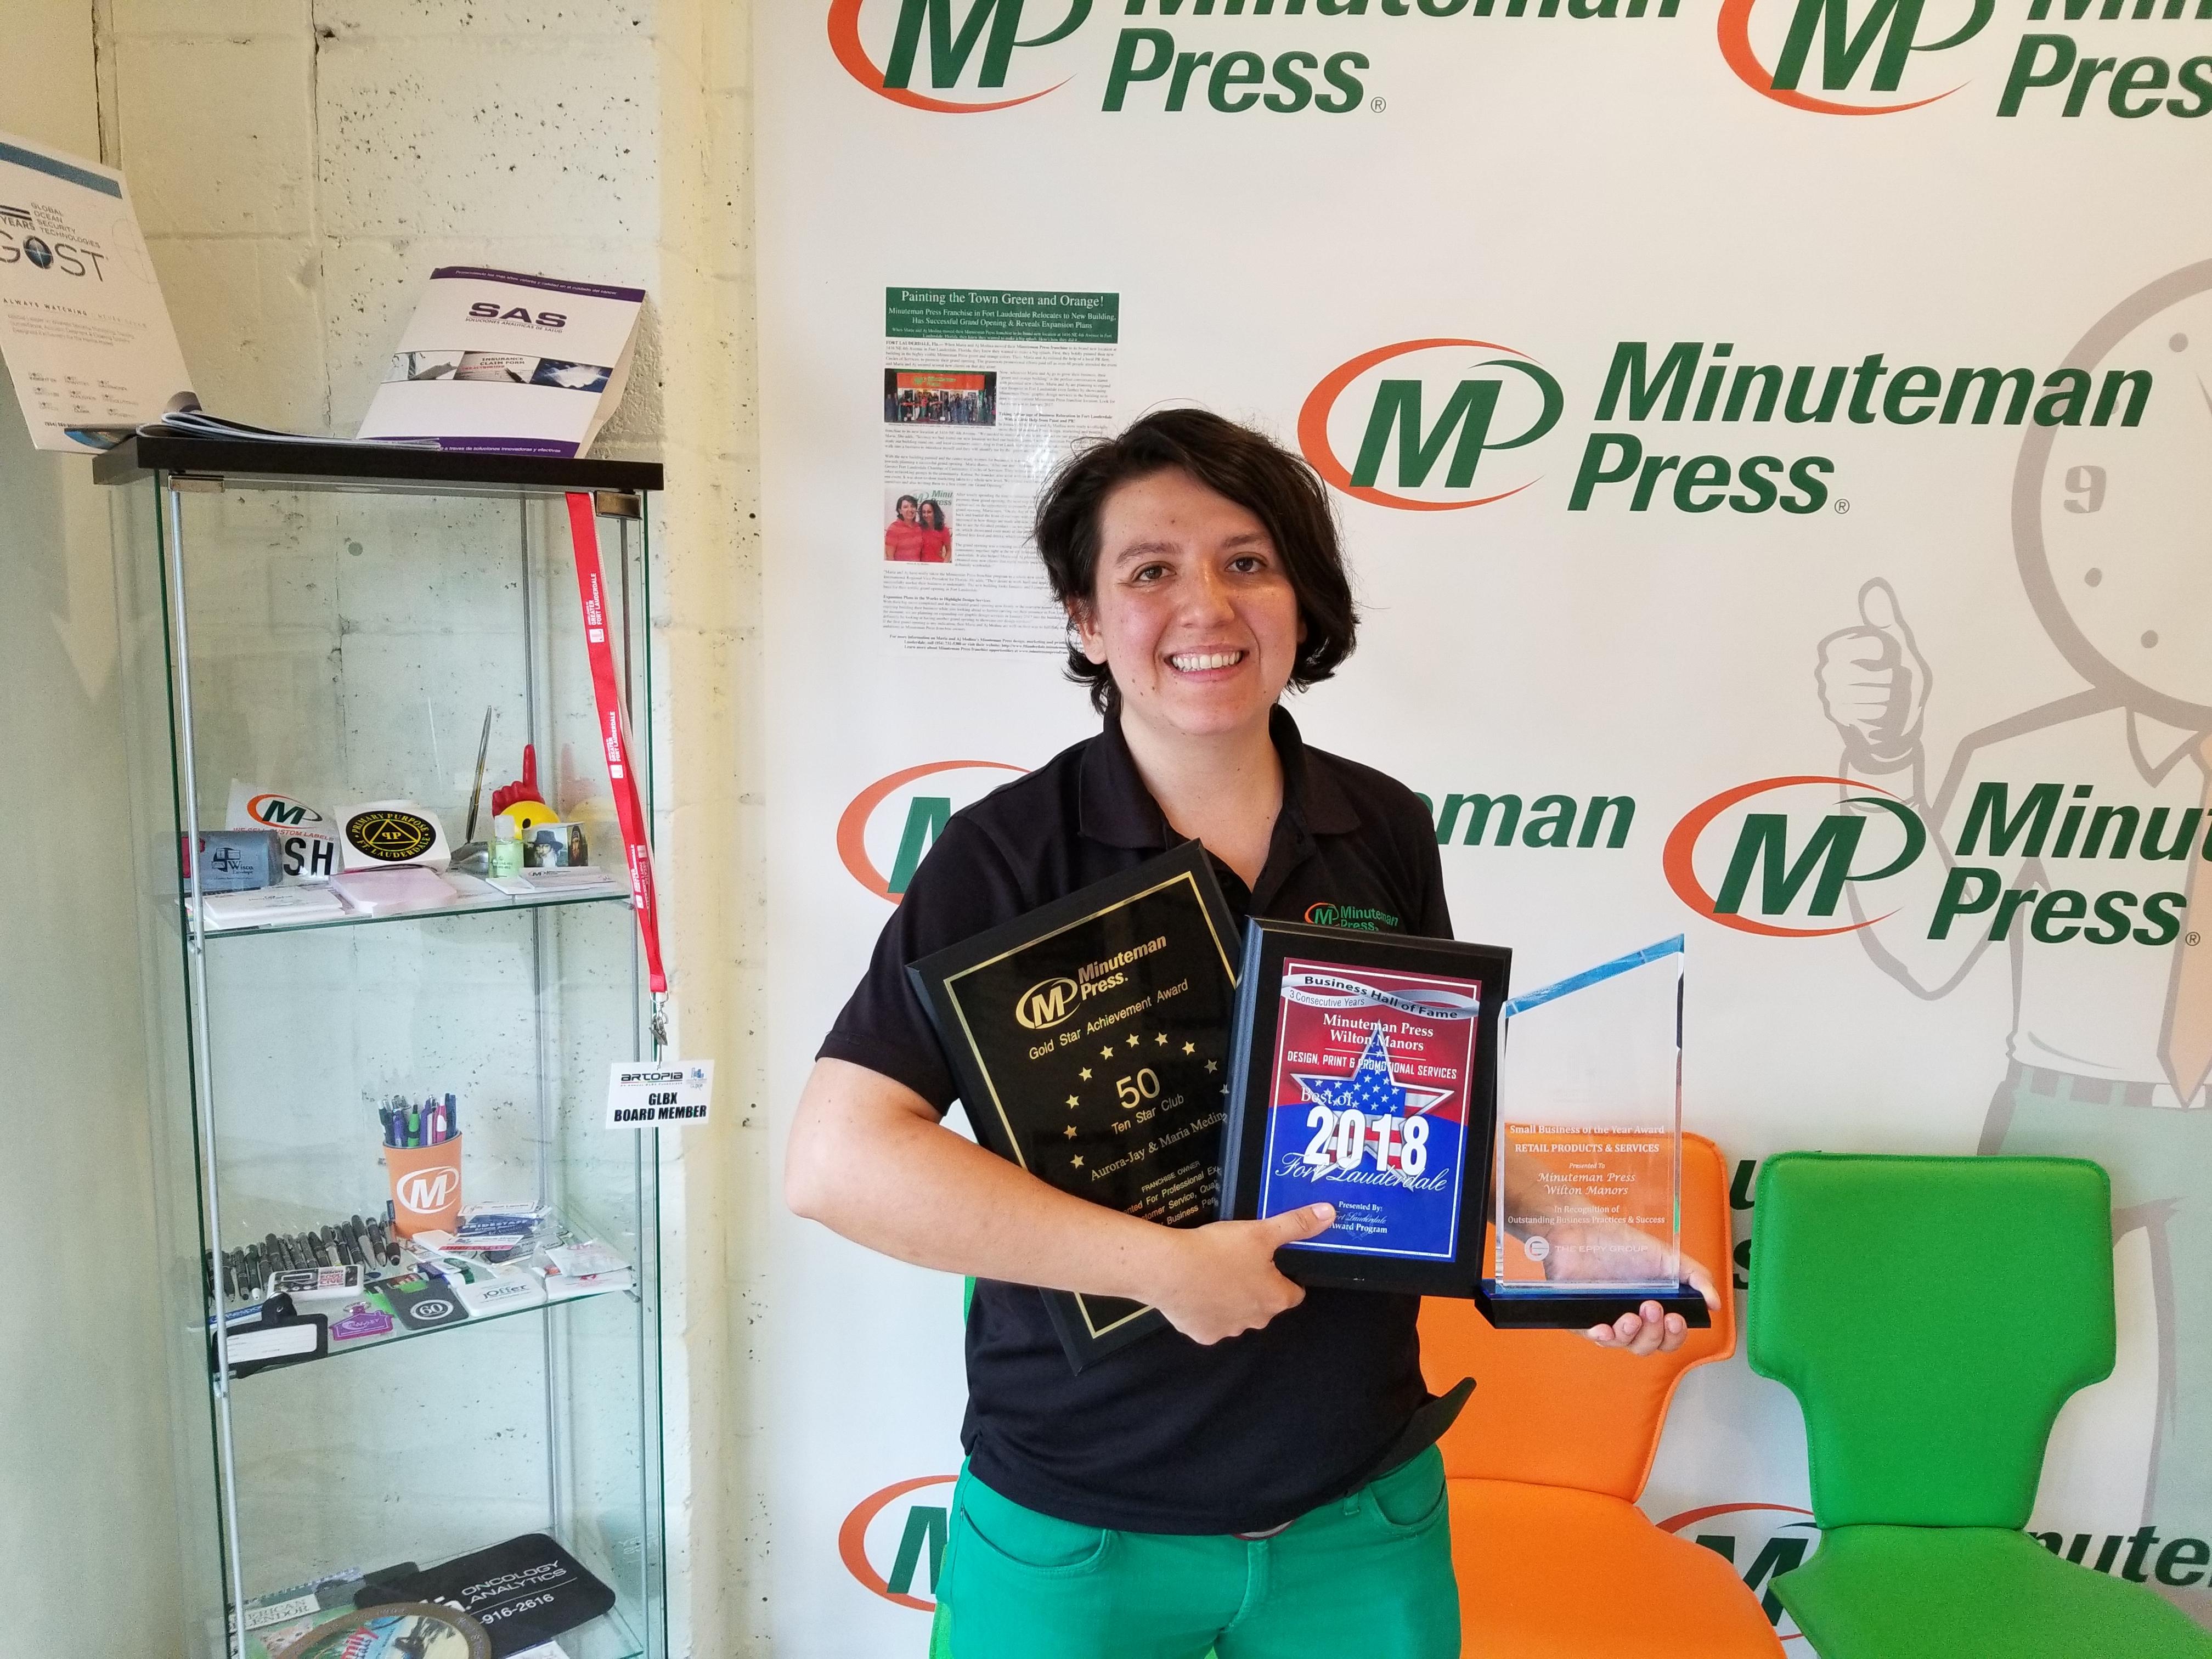 Maria Medina, owner, Minuteman Press franchise, Fort Lauderdale, Florida. http://www.minutemanpressfranchise.com